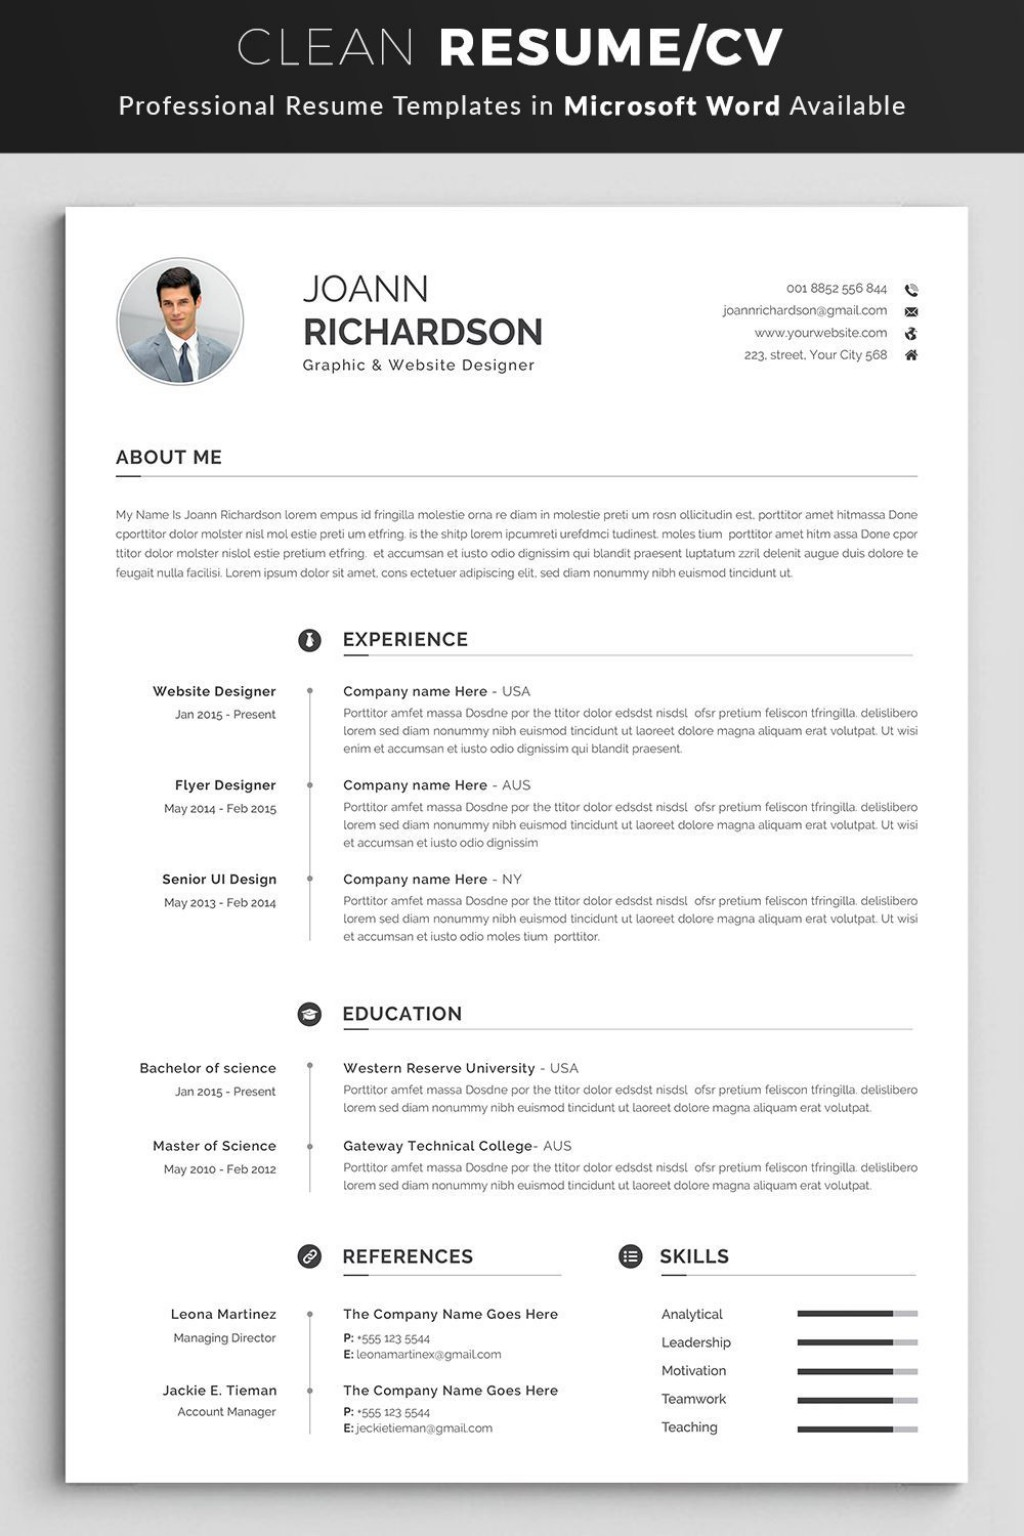 000 Stirring Professional Resume Template Word Photo  Microsoft Download Free 2010 2019Large